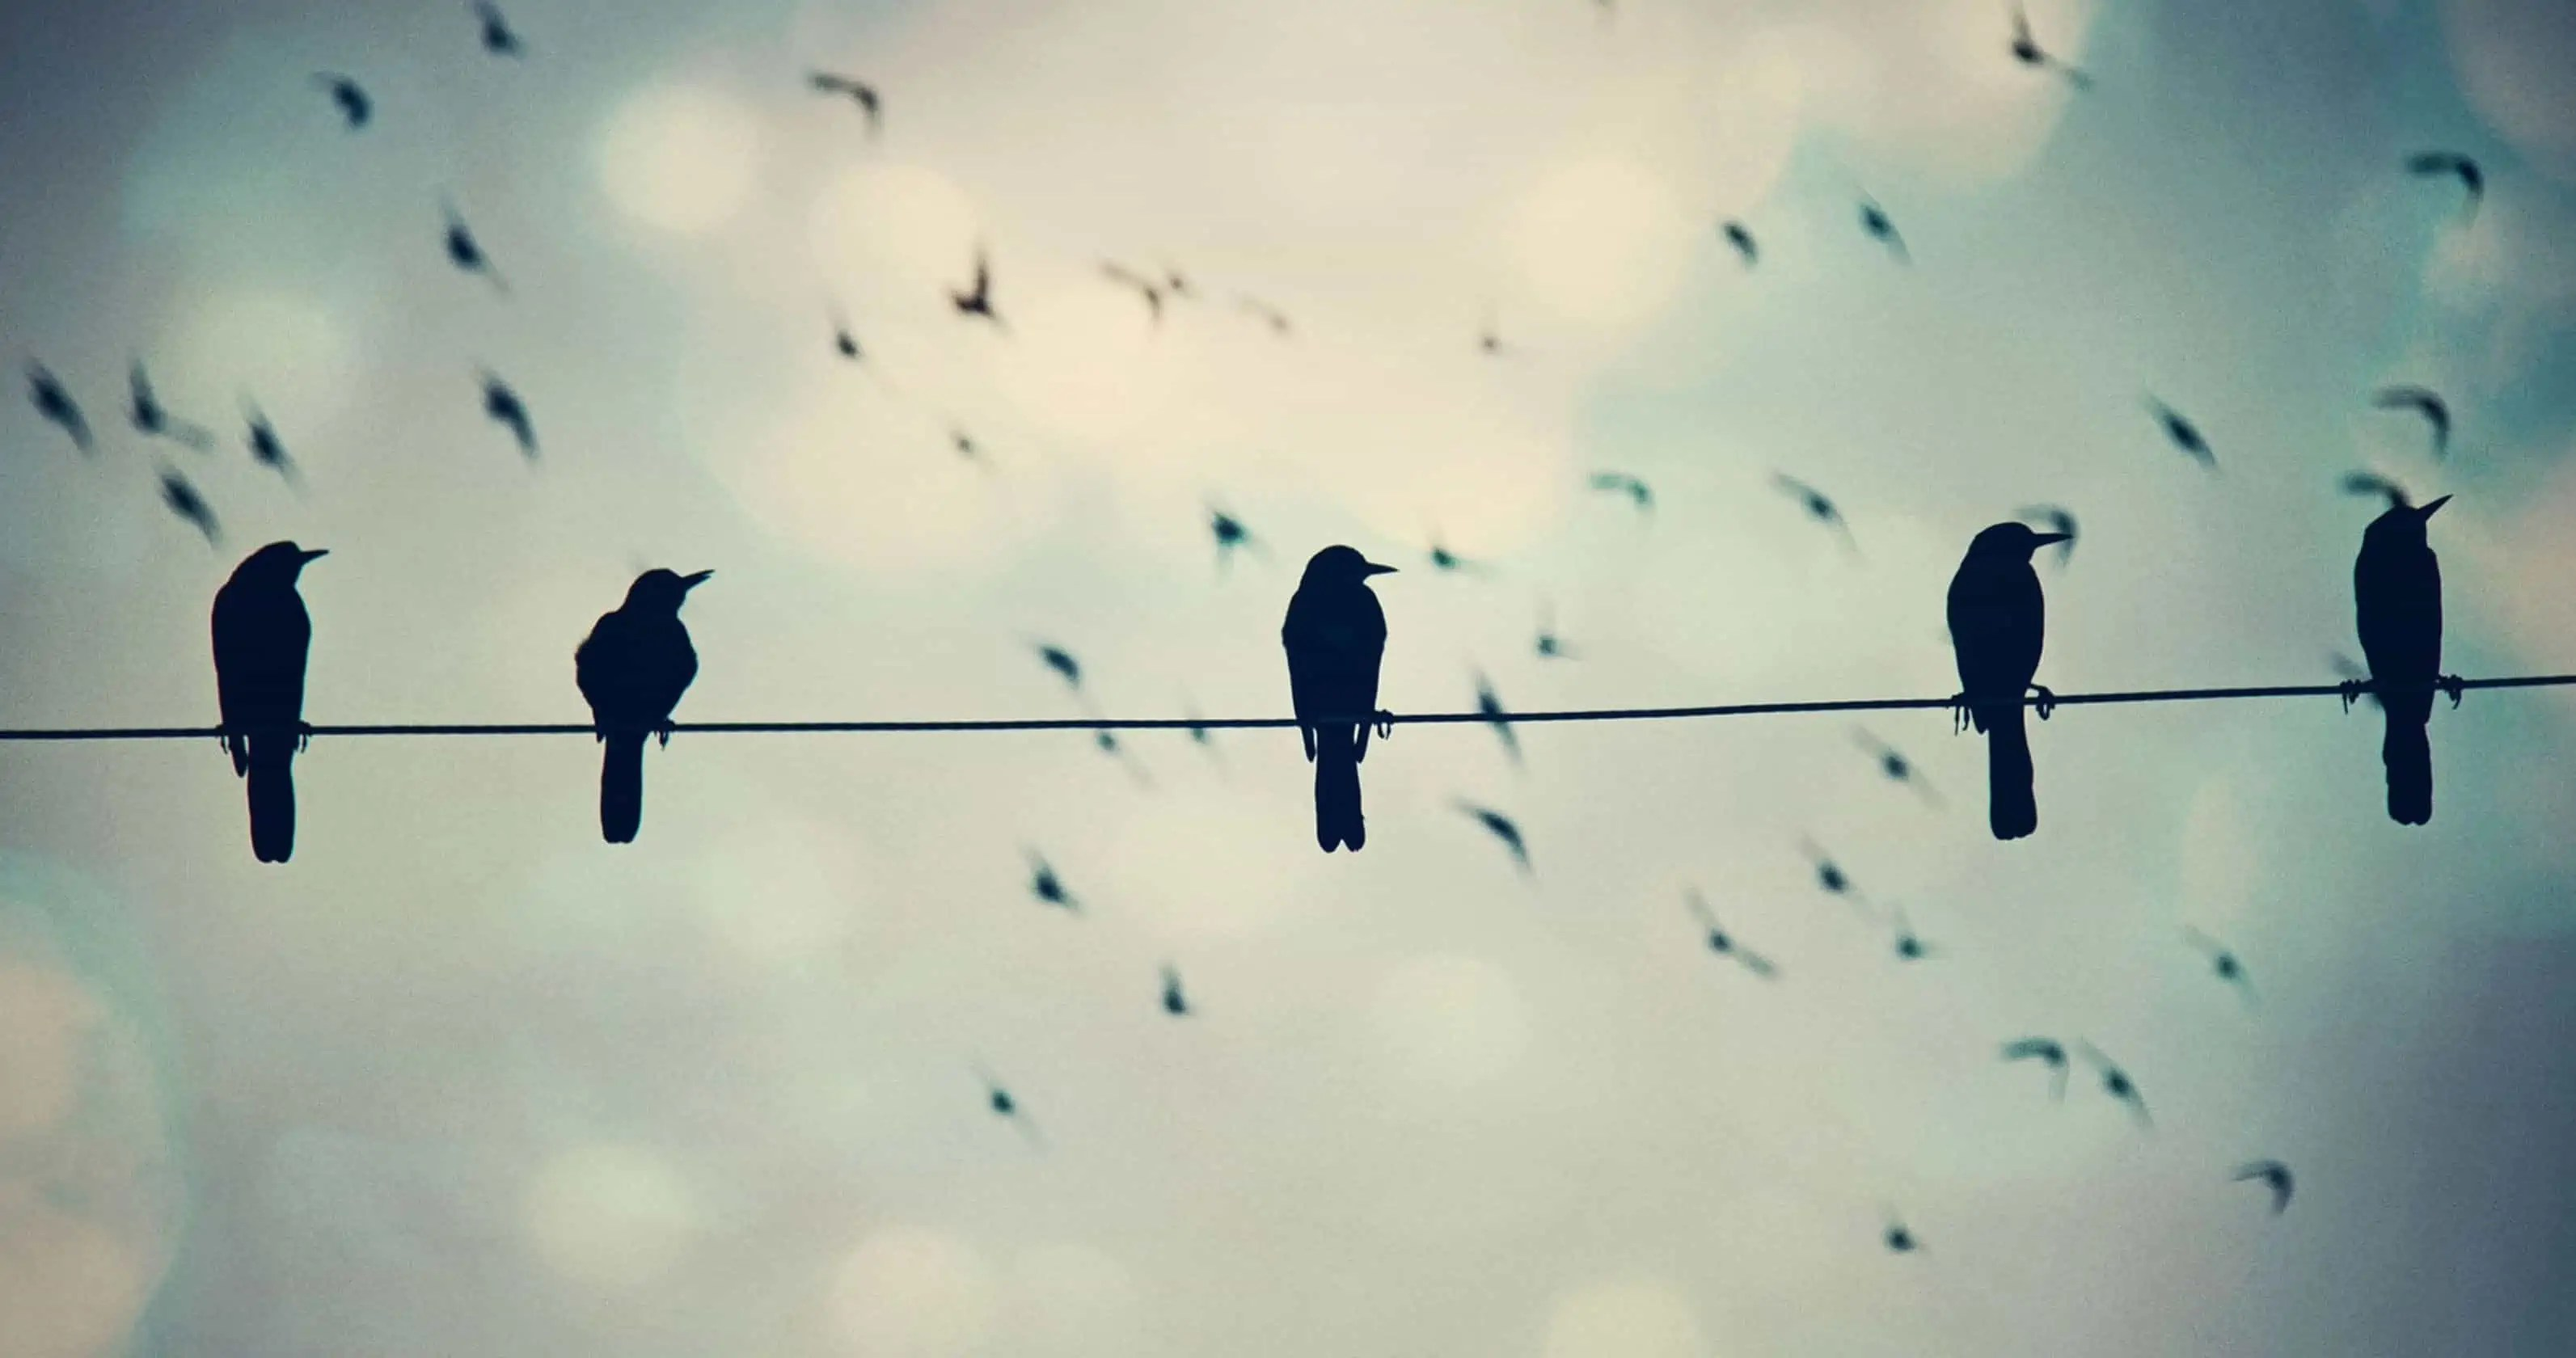 birds-on-a-wire_wallpprs.com_